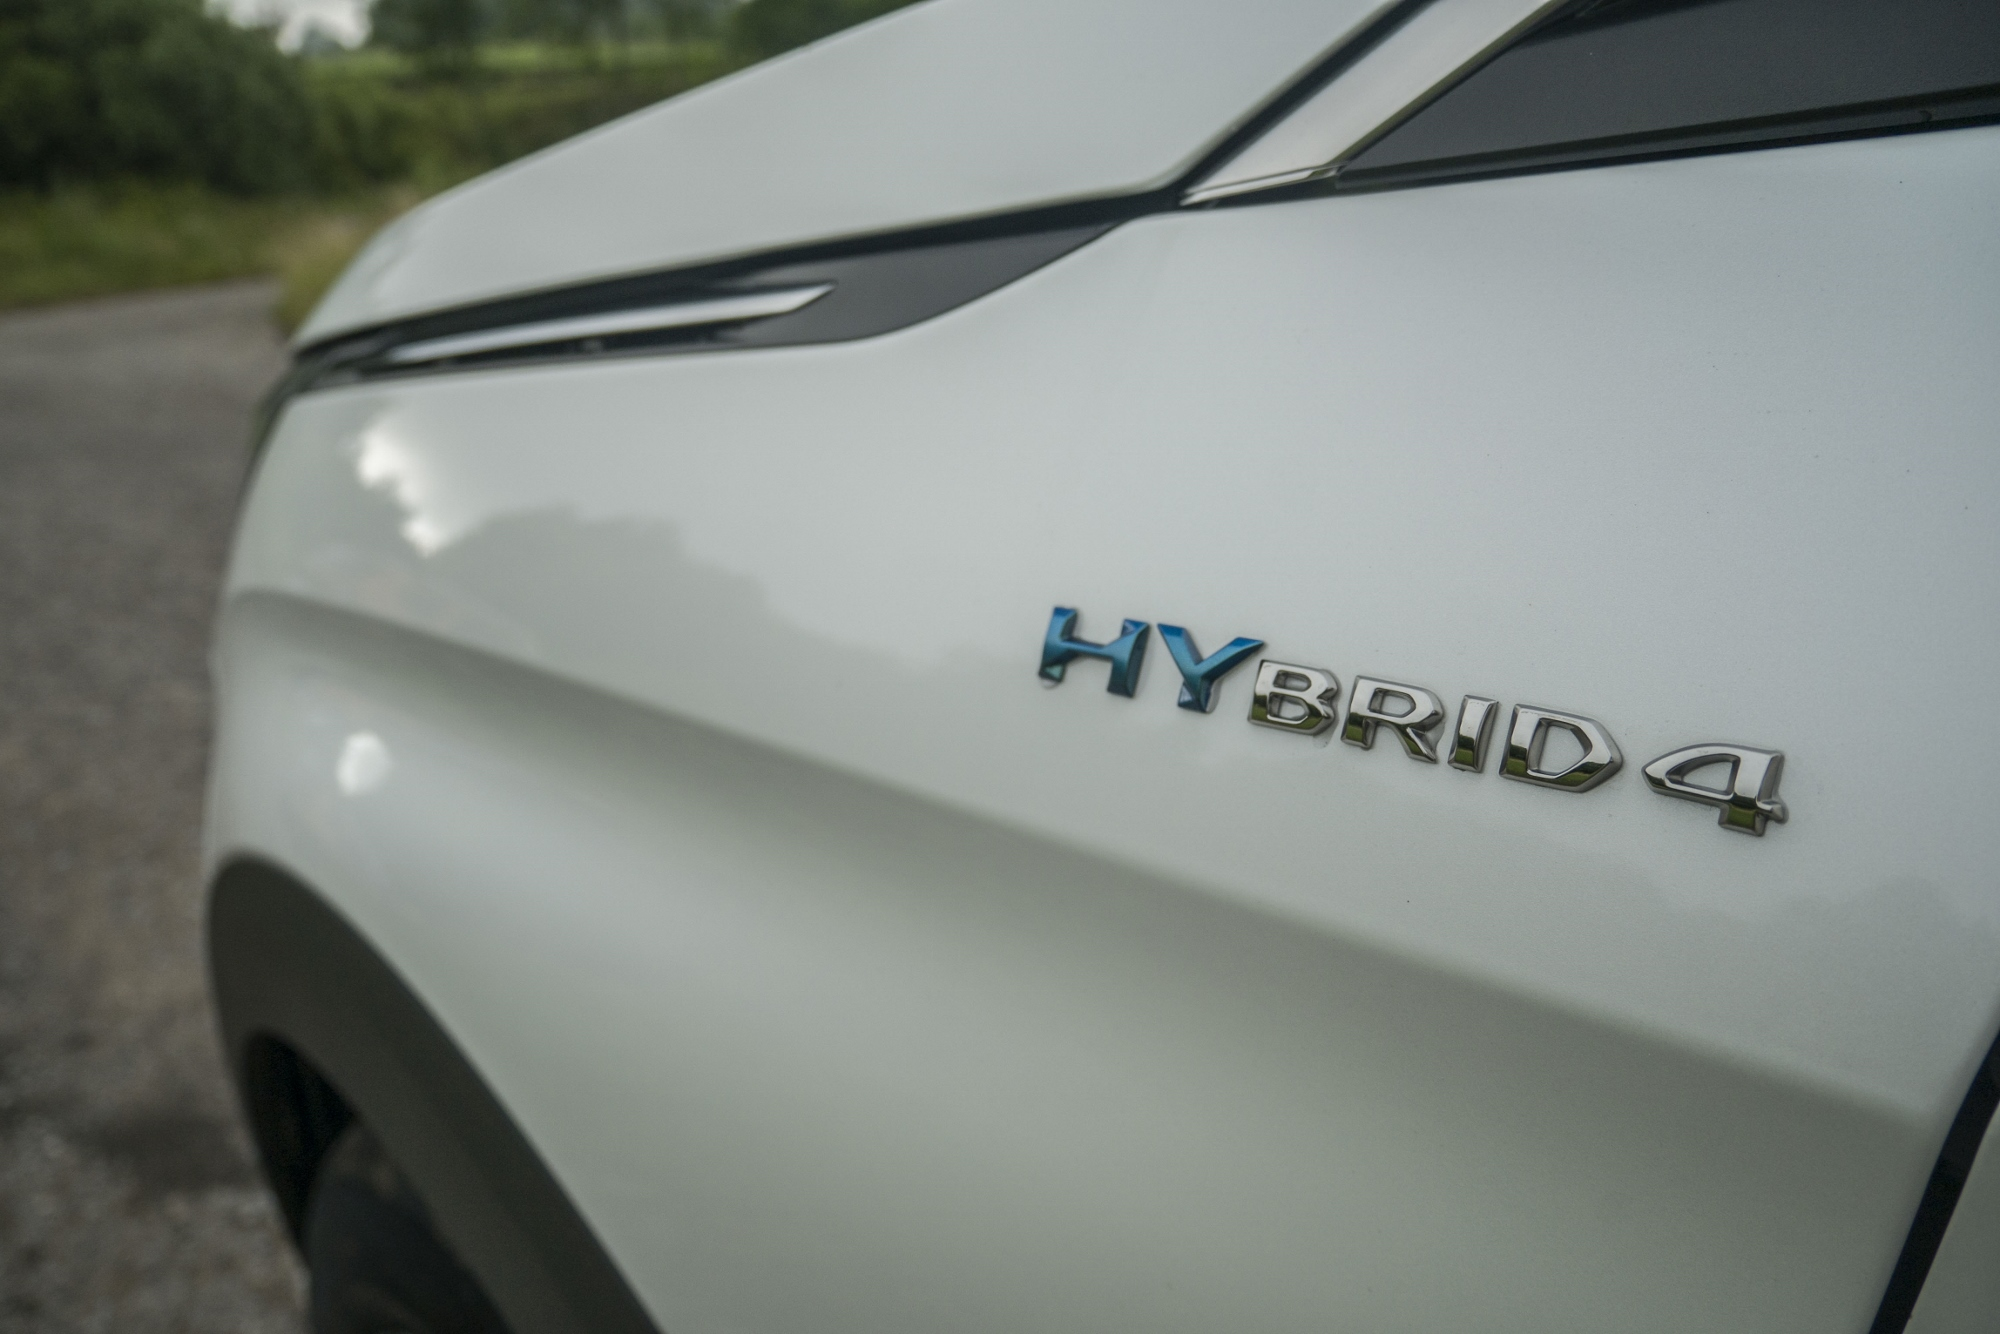 Test: Peugeot 3008 posúva schopnosti plug in hybridov TmFffAyksL peugeot-3008-hybrid4-20